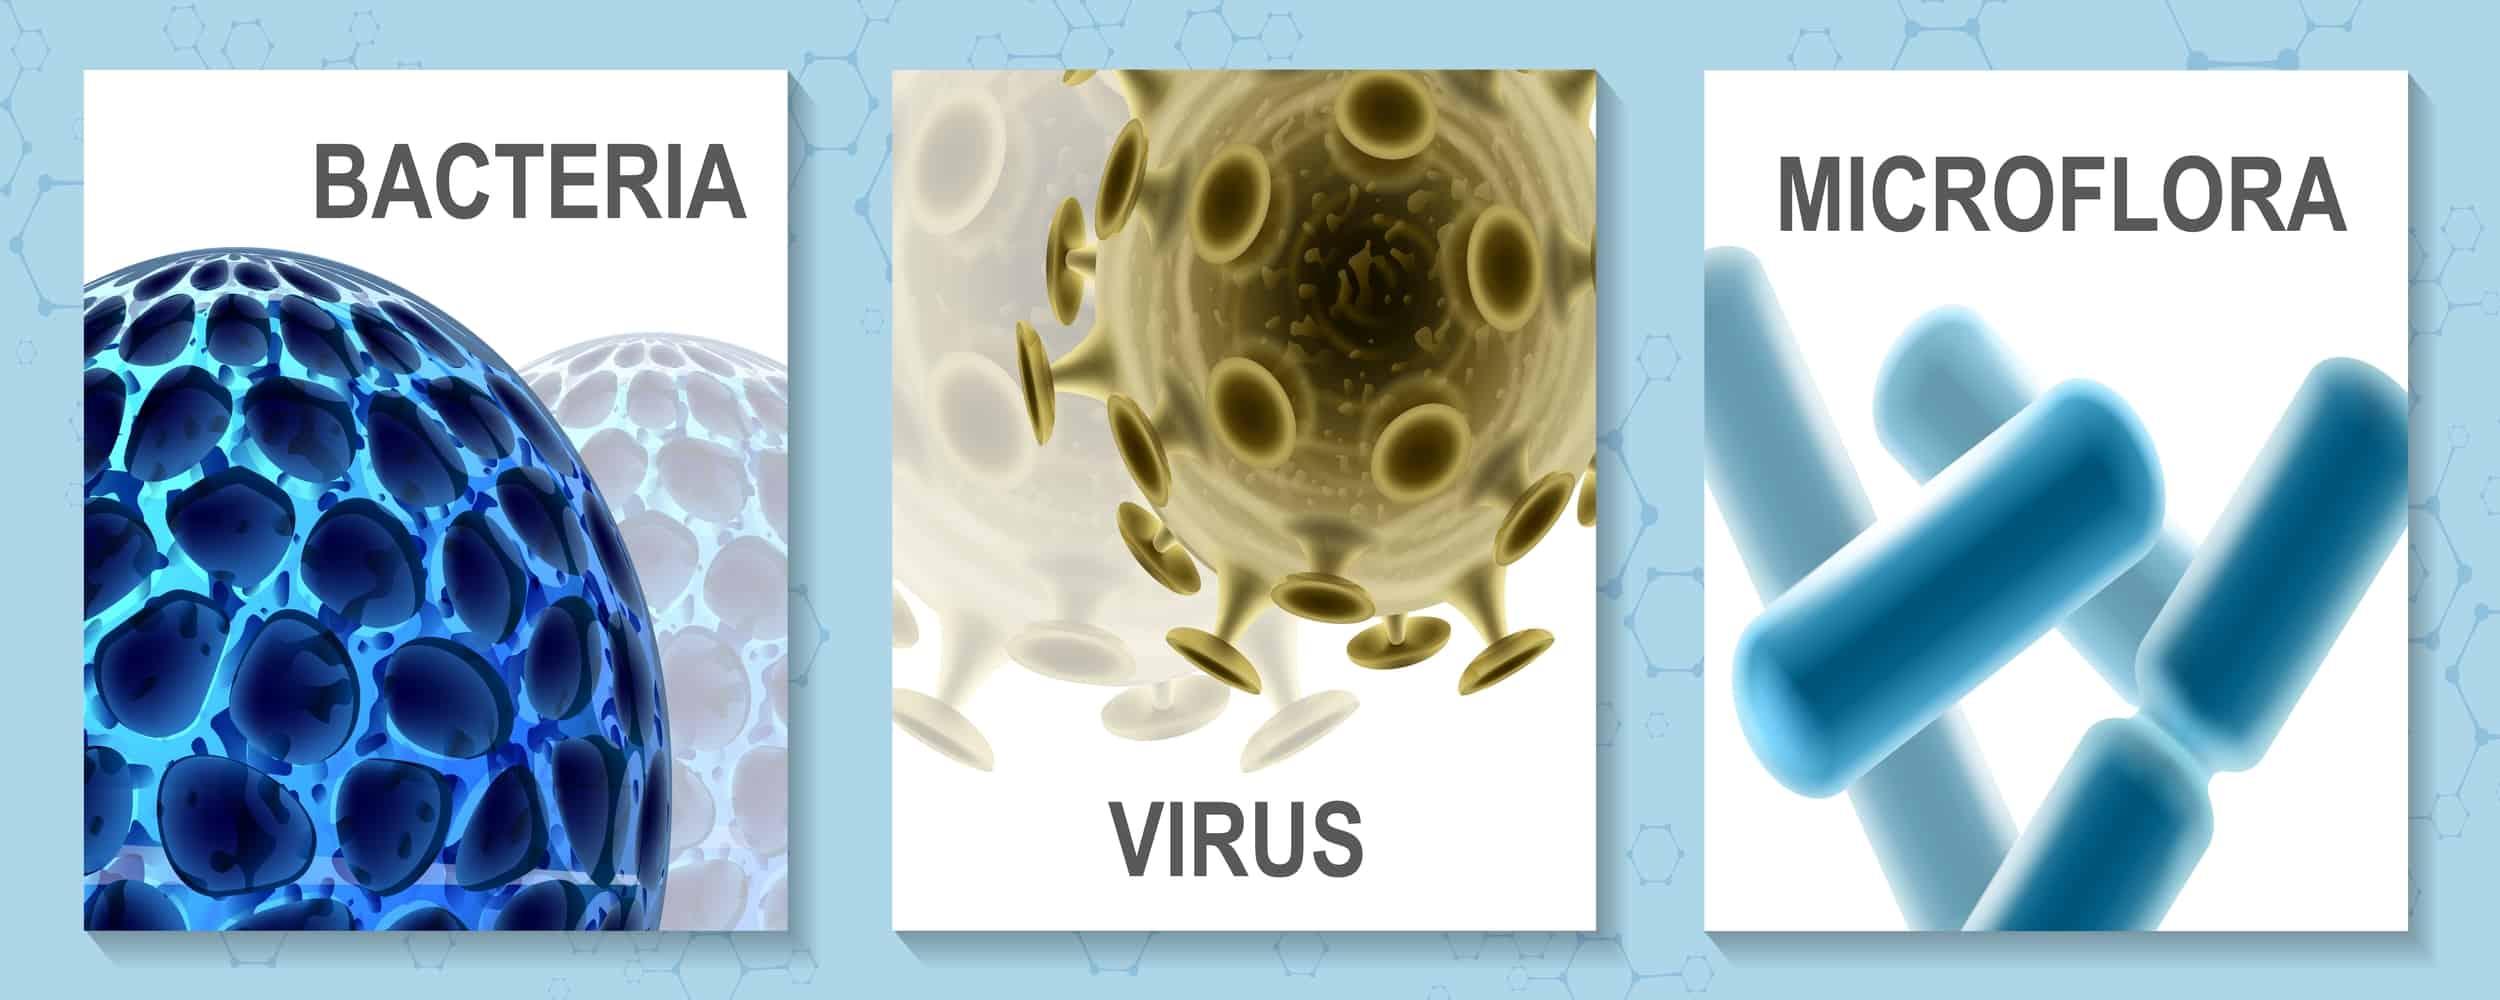 kills bacteria and fungi